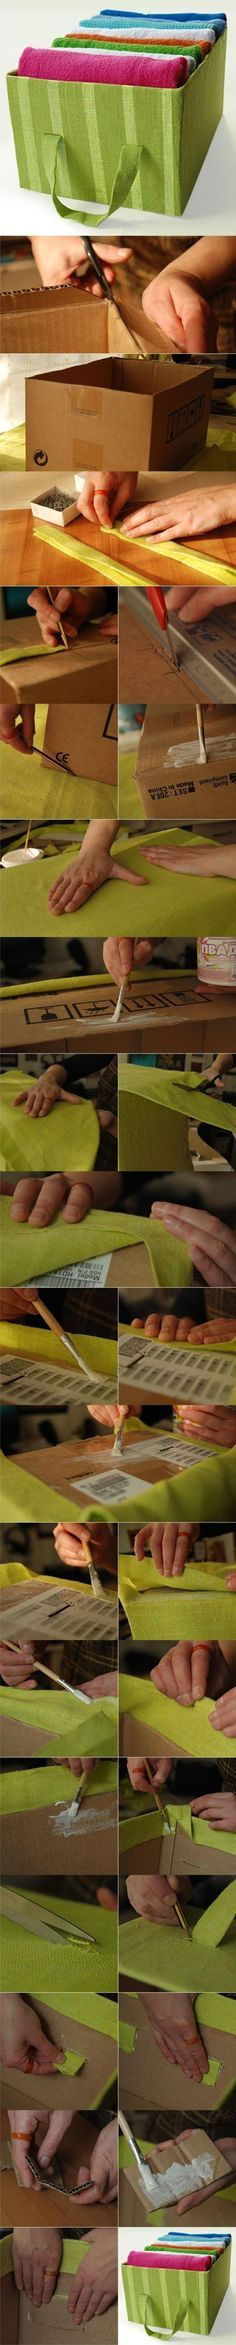 Caja para organizar lenceria. Te presentamos esta económica pero excelente opción bien decorativa para organizar tus toallas. http://wp.me/p1ytFq-v0